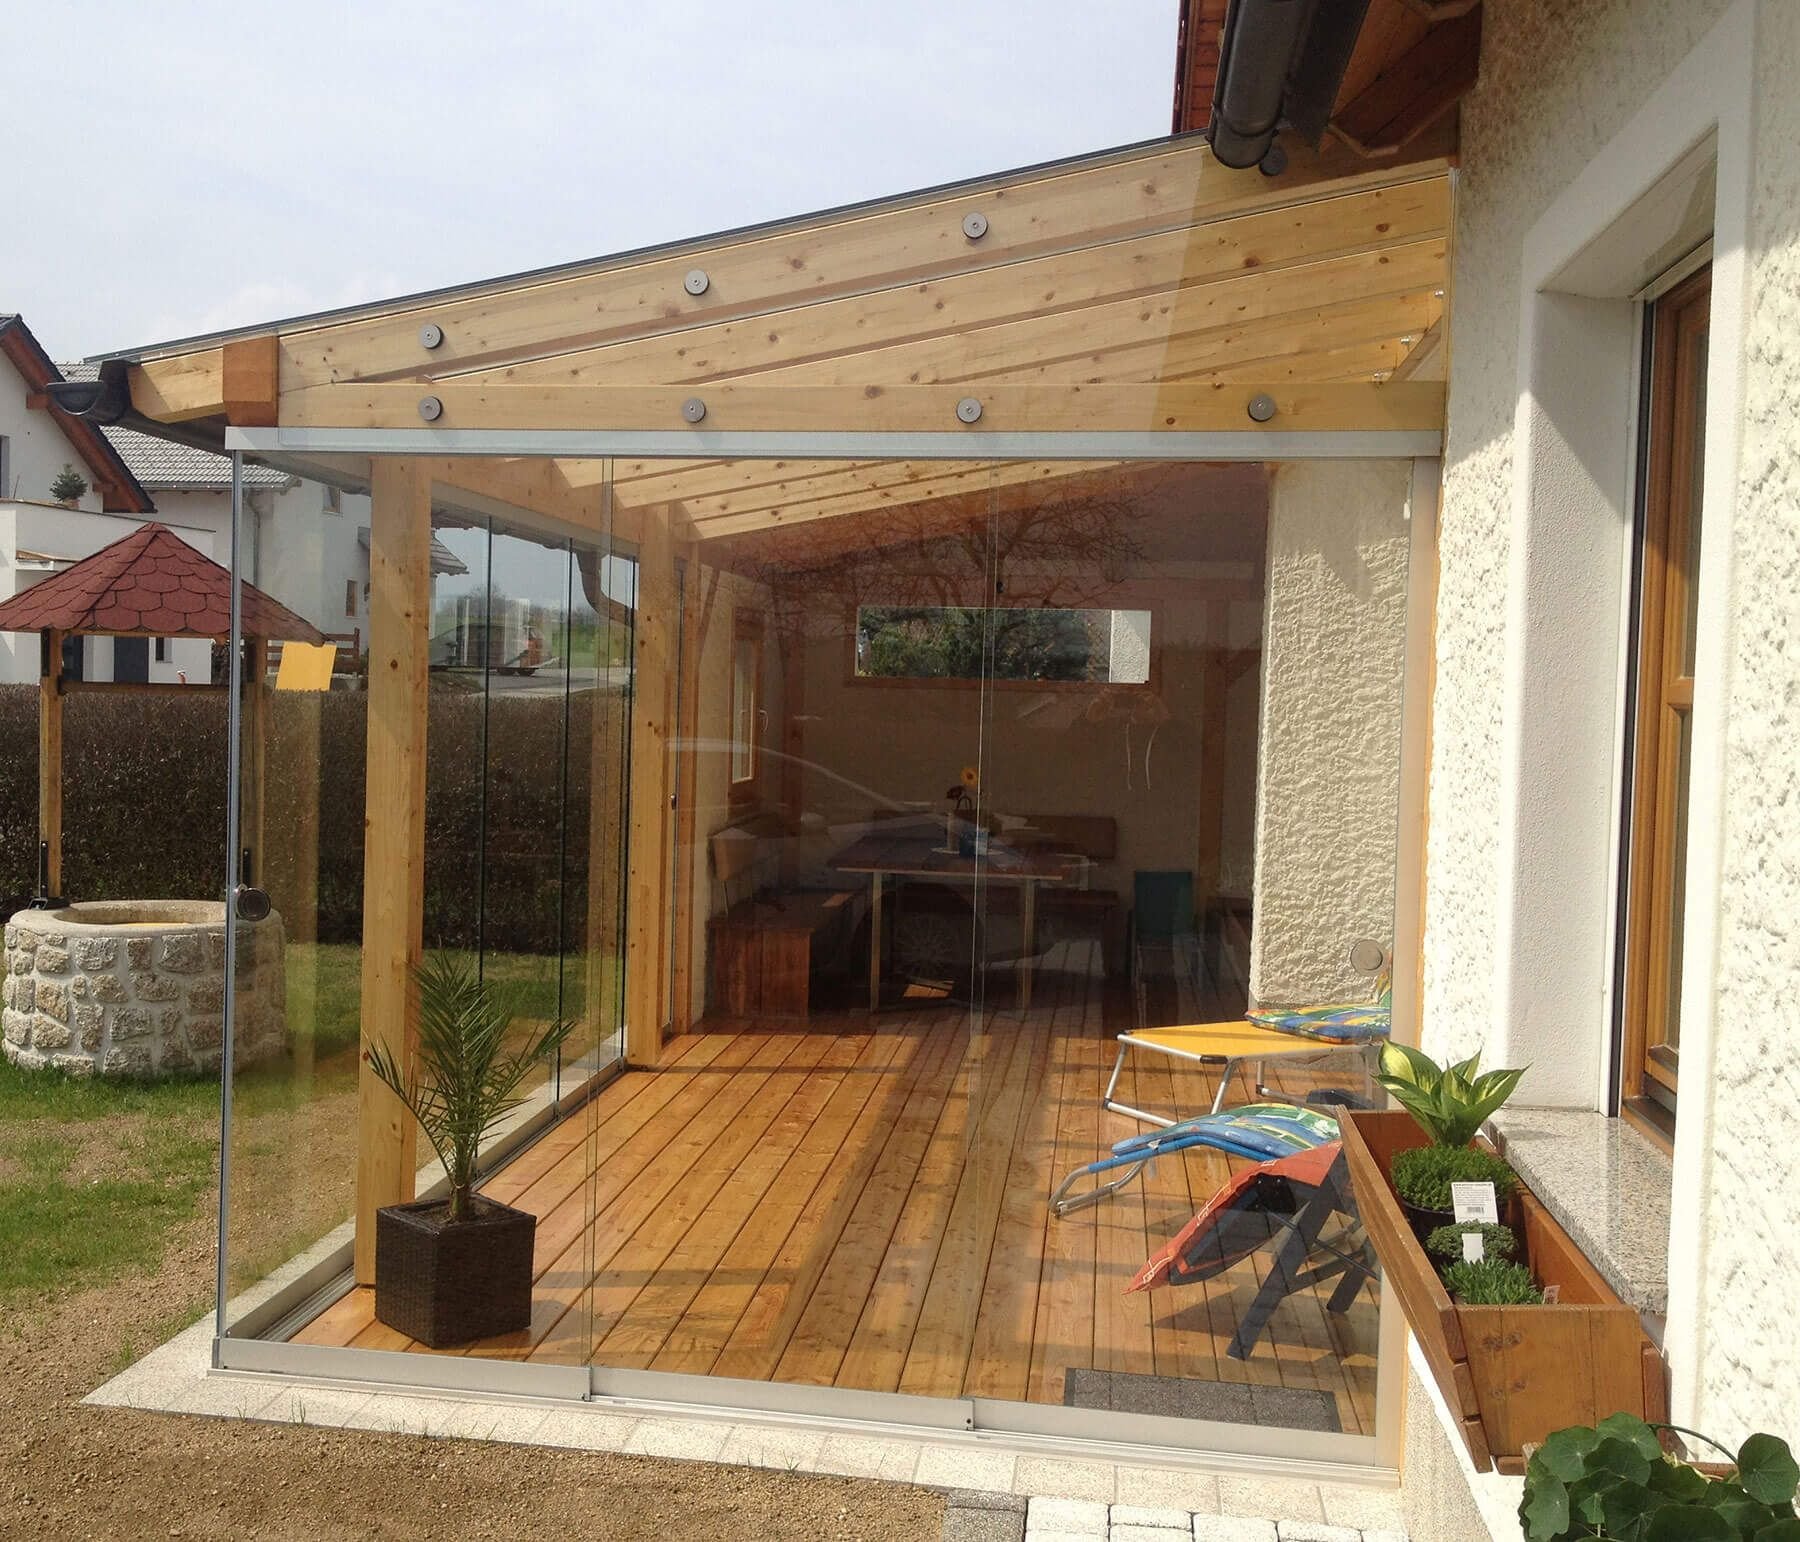 Schiebeverglasung In Holzkonstruktion Montiert